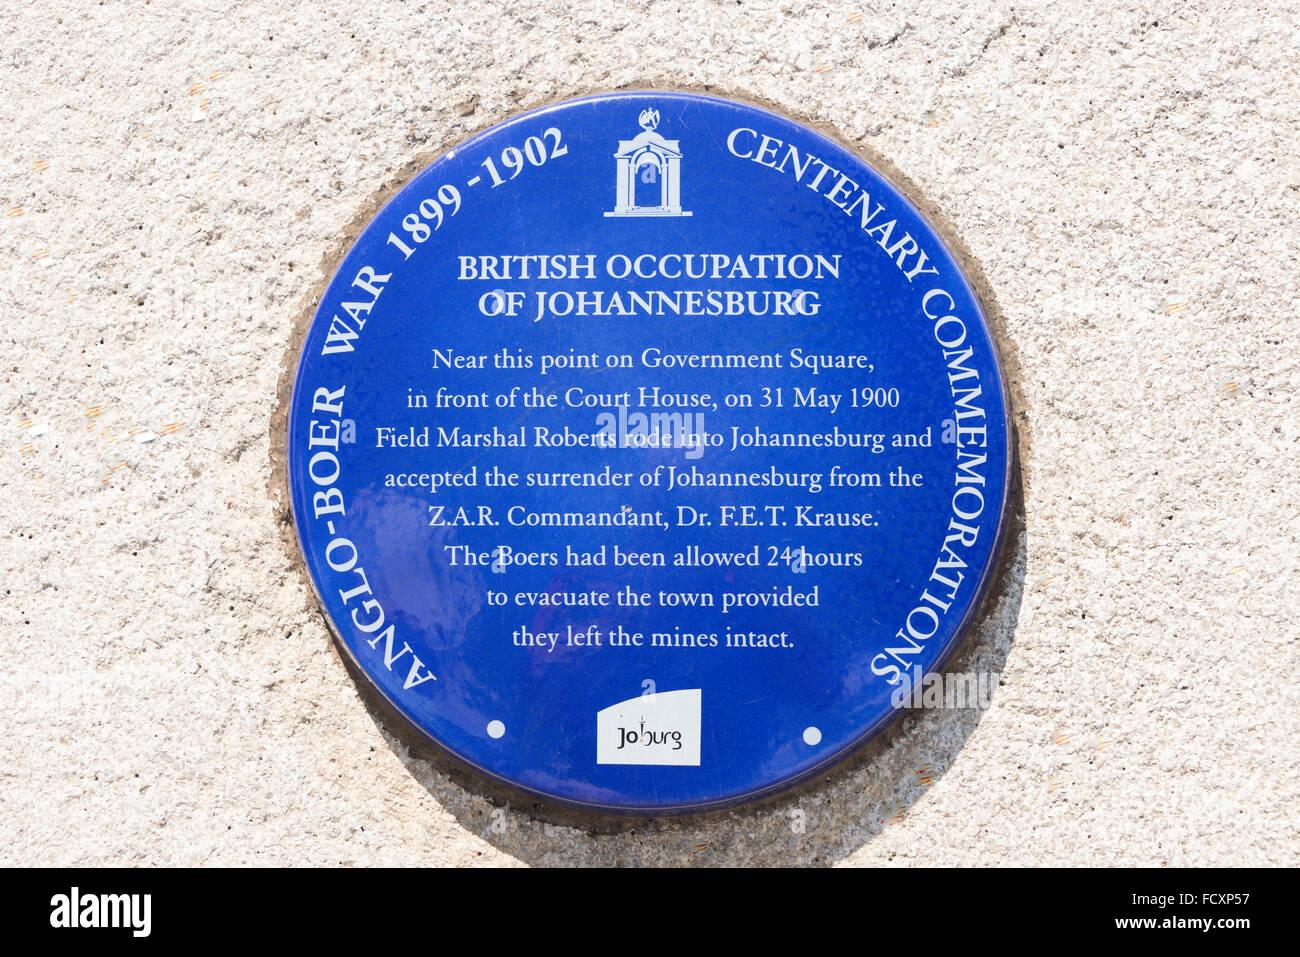 Anglo-Boer War commemoration plaque, Gandhi Square, Johannesburg, City of Johannesburg Municipality, Gauteng, South - Stock Image